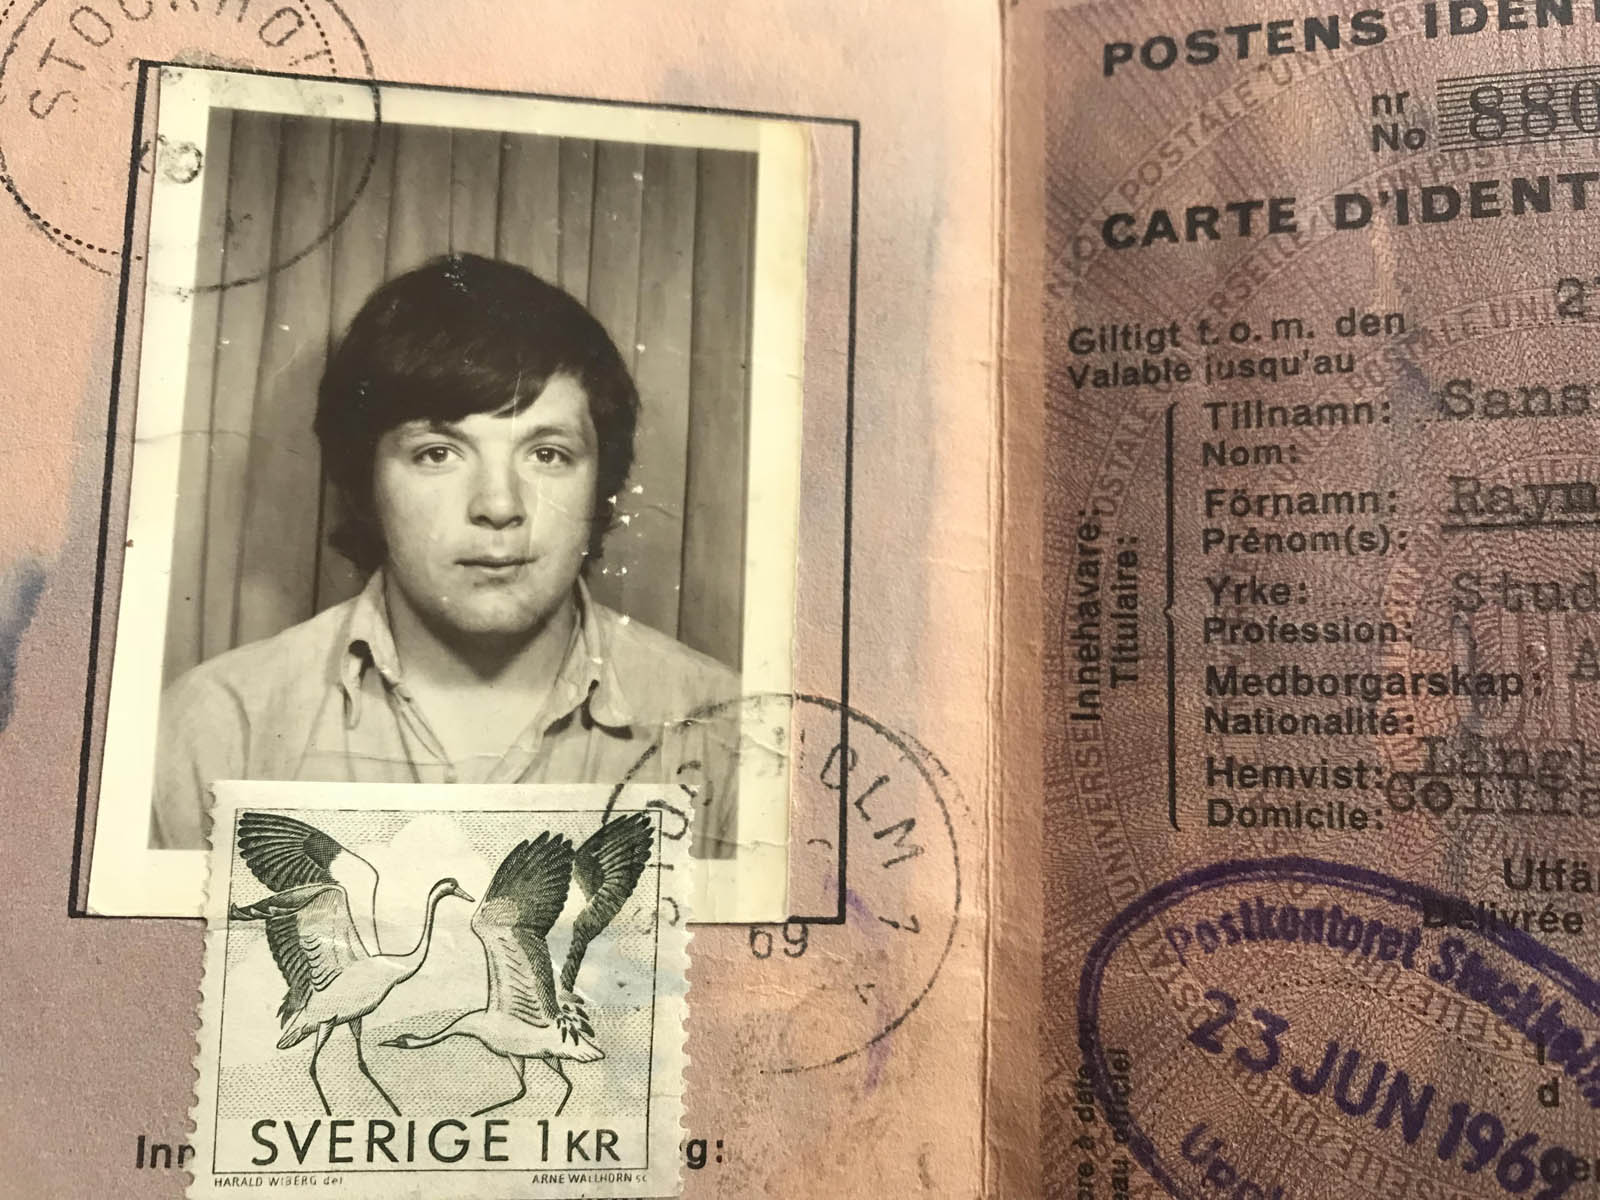 Ray Sansiviero Swedish identity card 1969